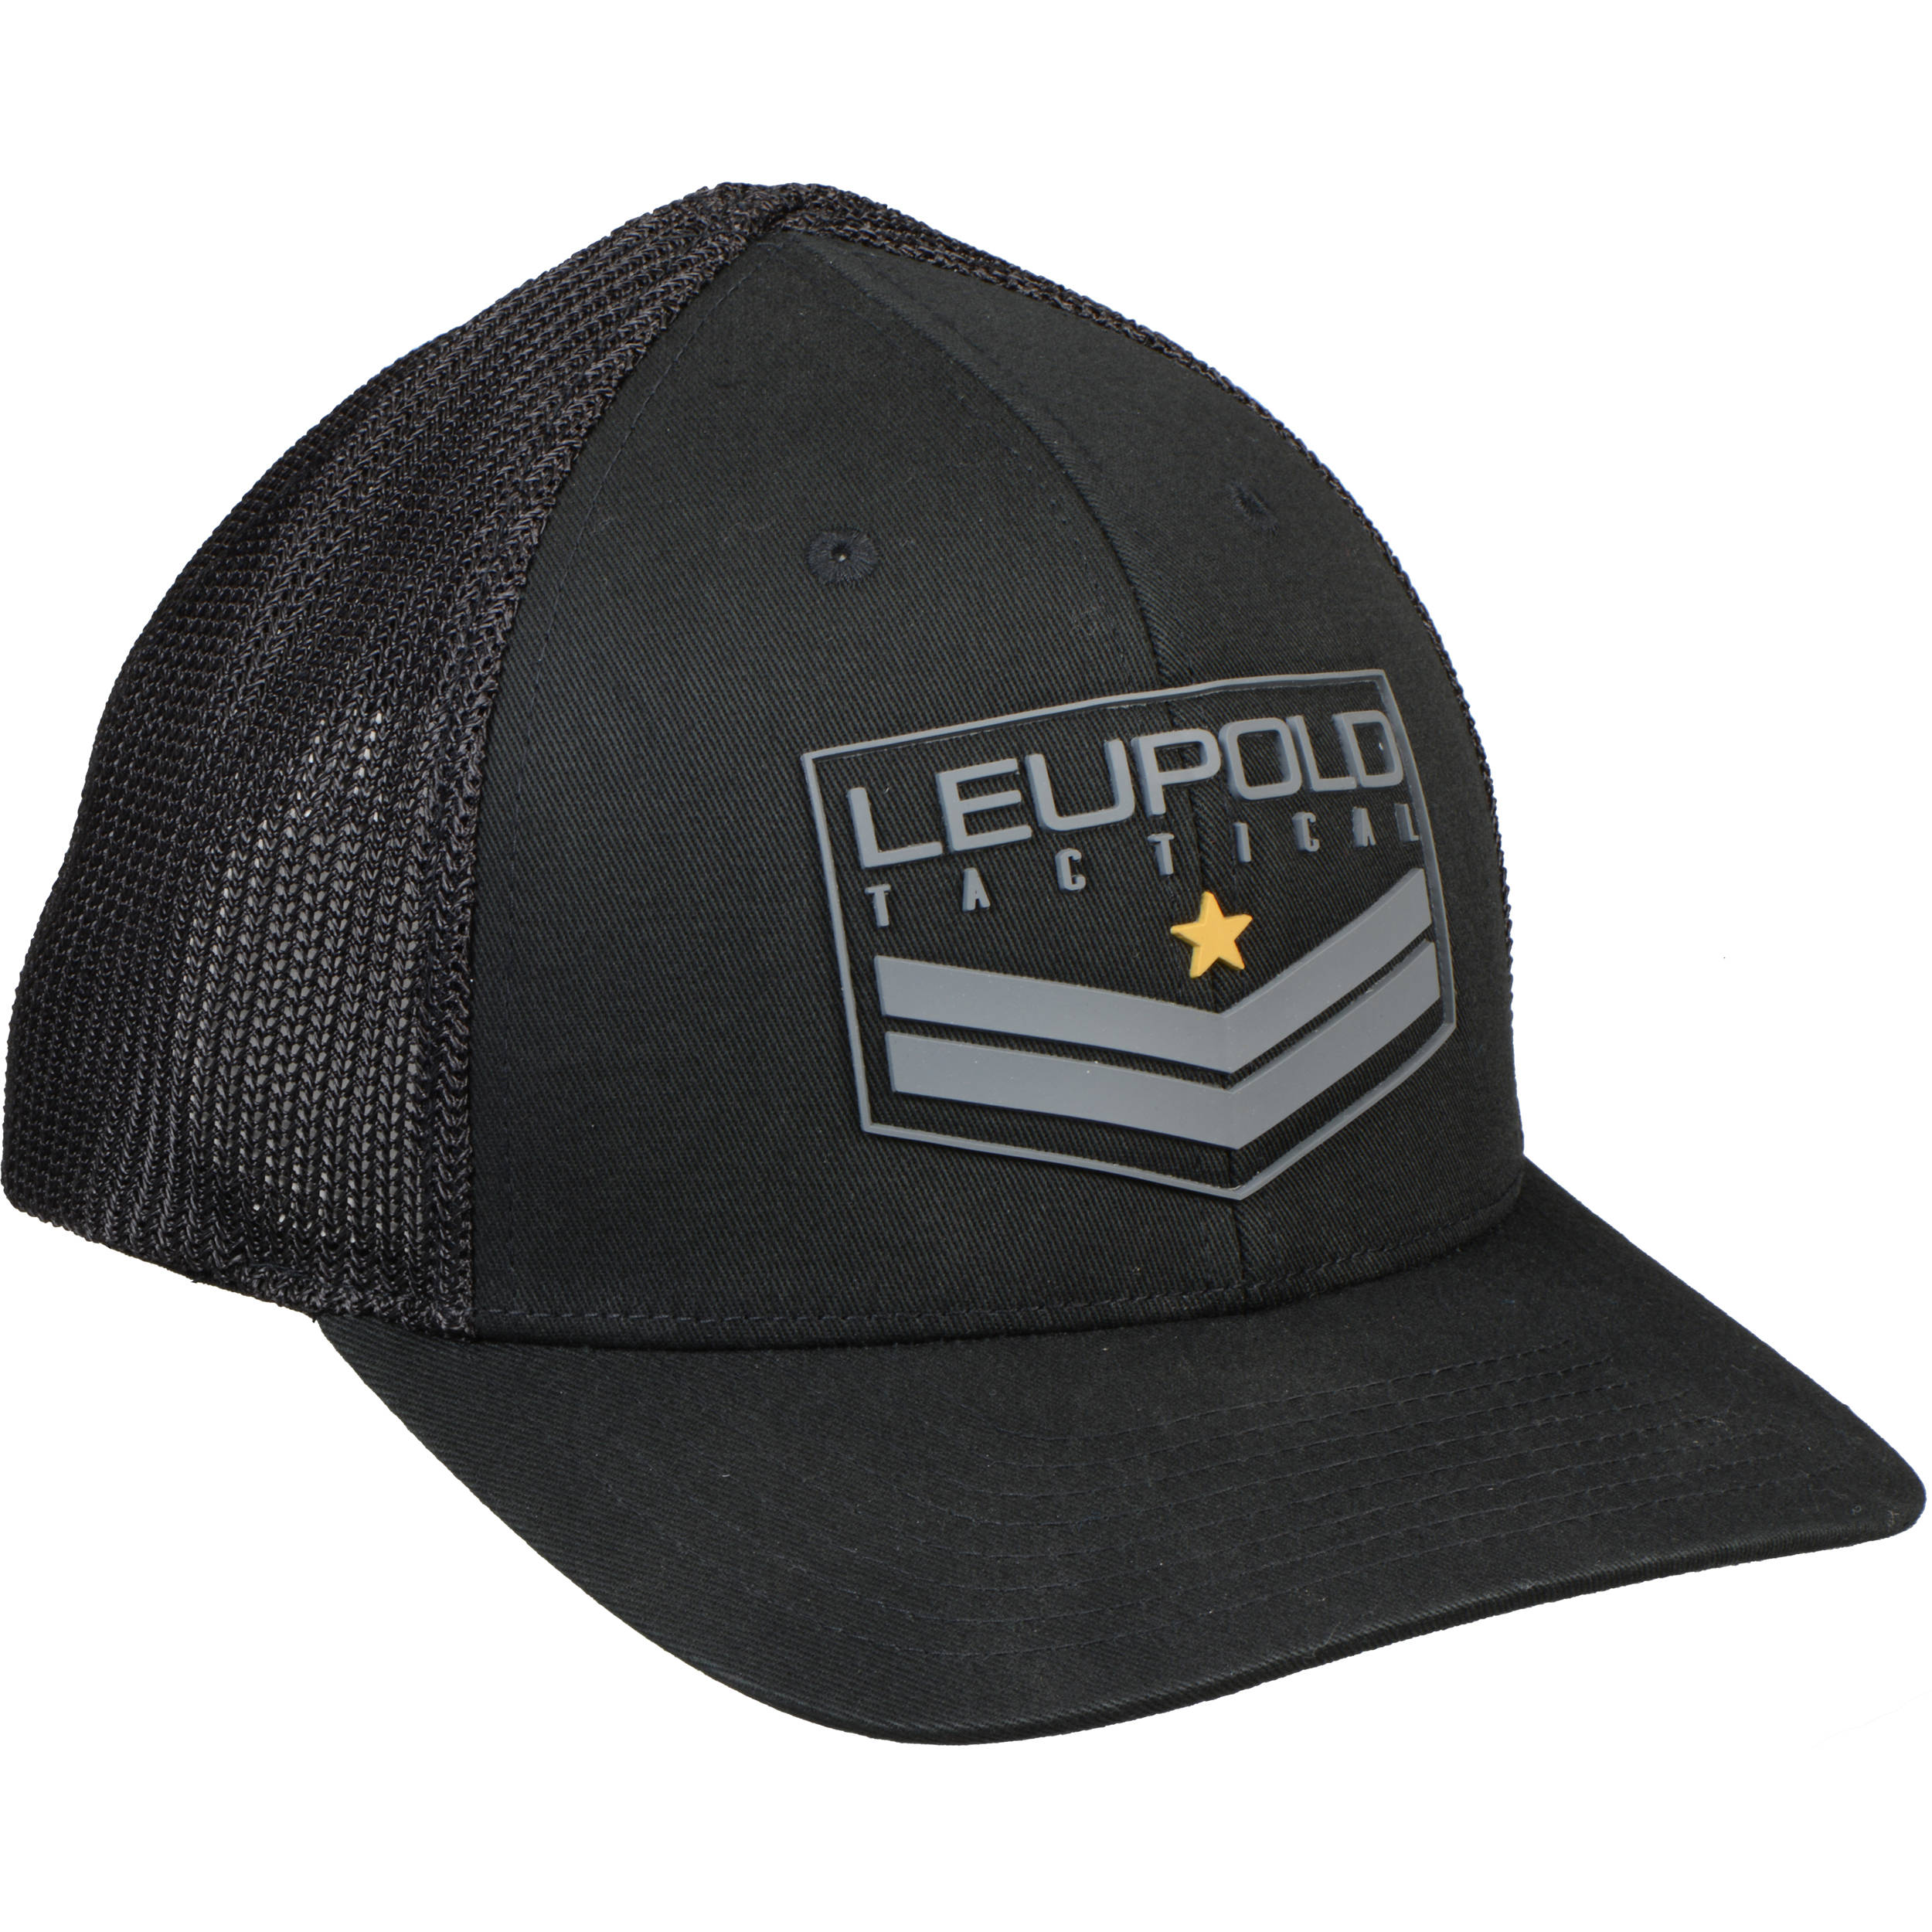 Leupold Tact Badge FlexFit Hat (Black e0b4a7601ce0